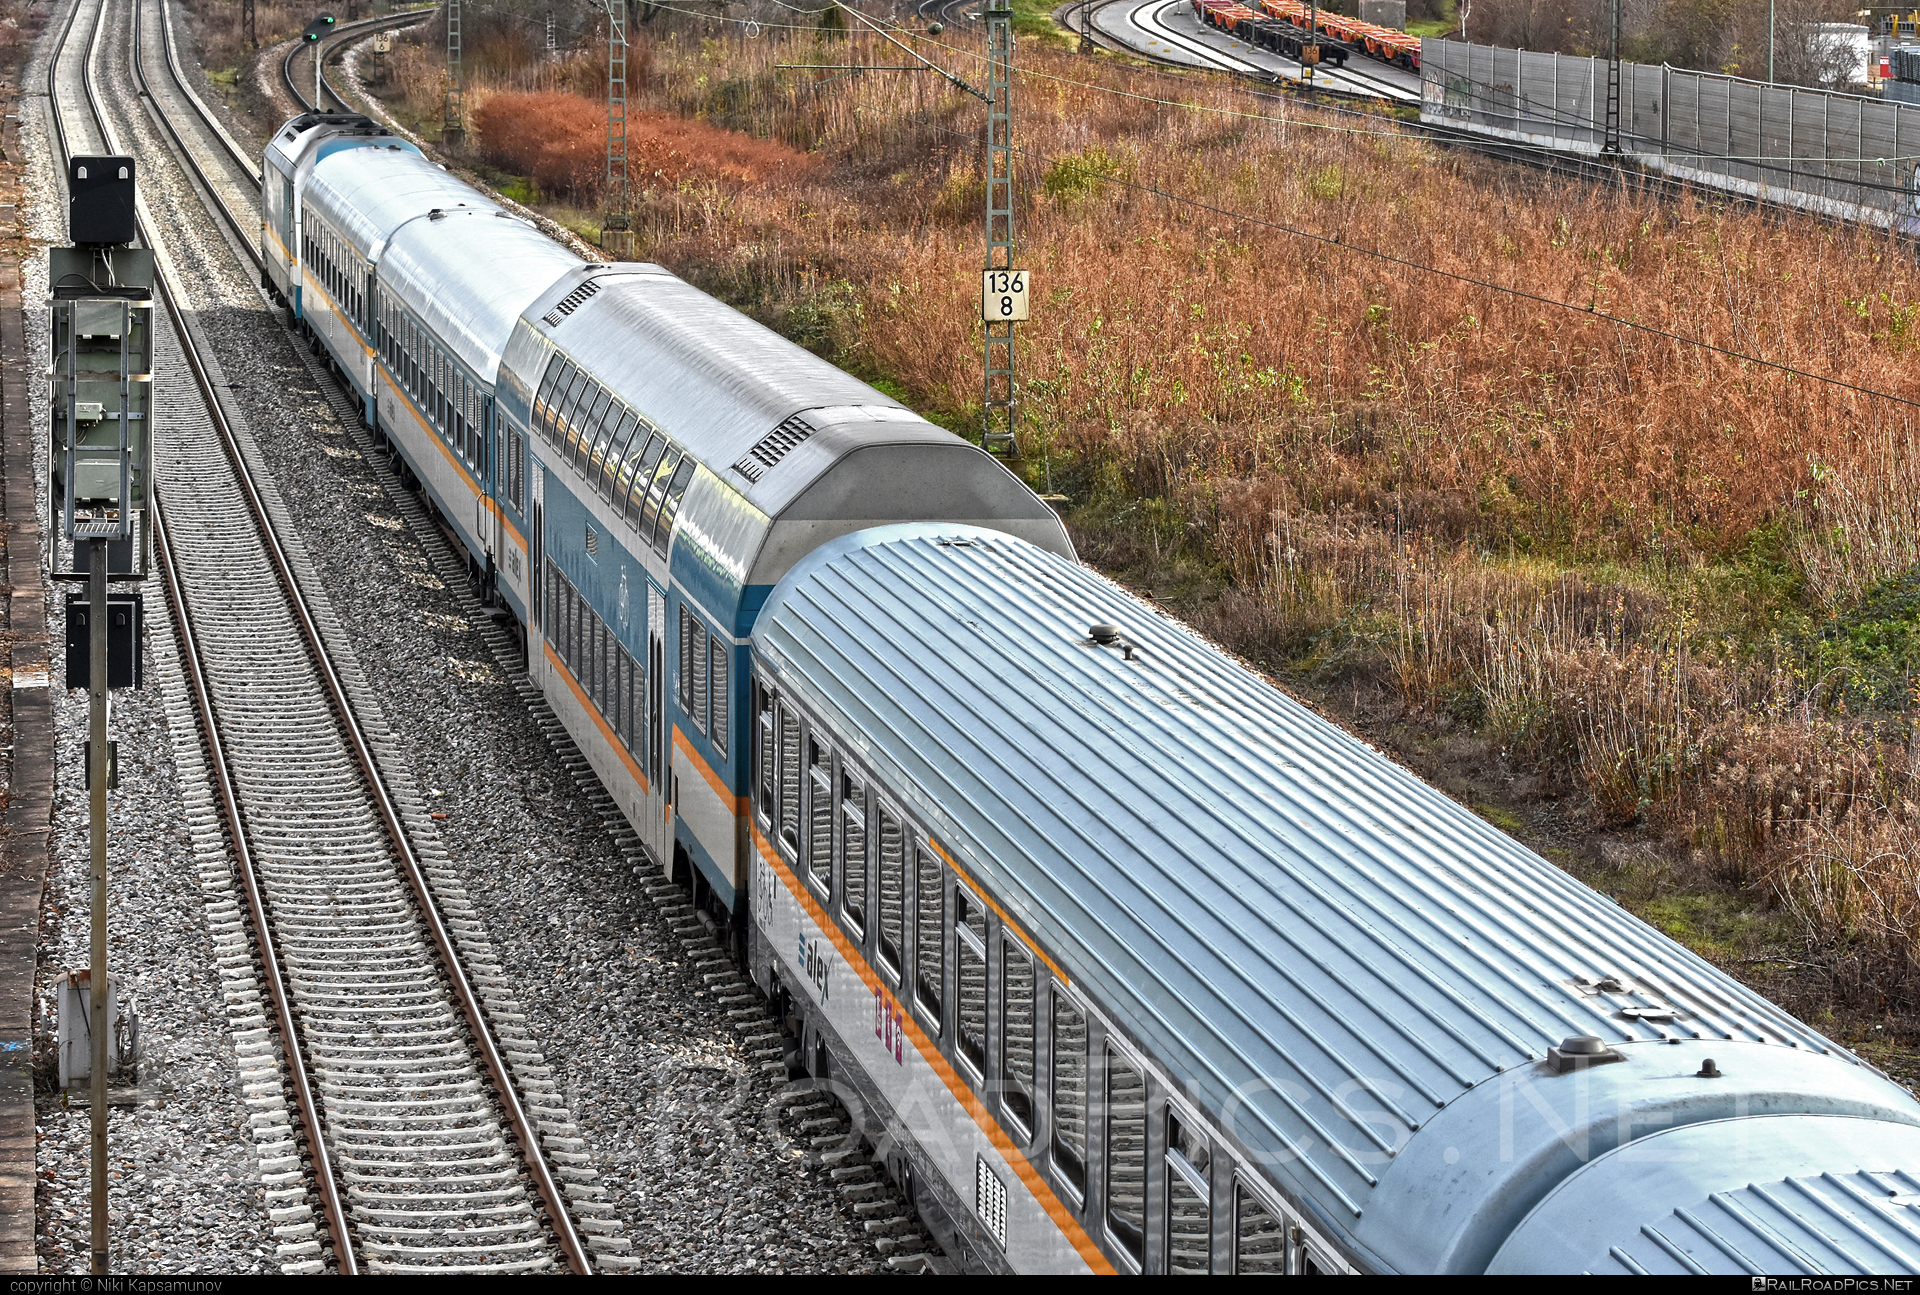 Siemens ER20 - 223 064 operated by Die Länderbahn GmbH DLB #alex #dielanderbahn #er20 #er20hercules #eurorunner #hercules #siemens #siemenser20 #siemenser20hercules #siemenseurorunner #siemenshercules